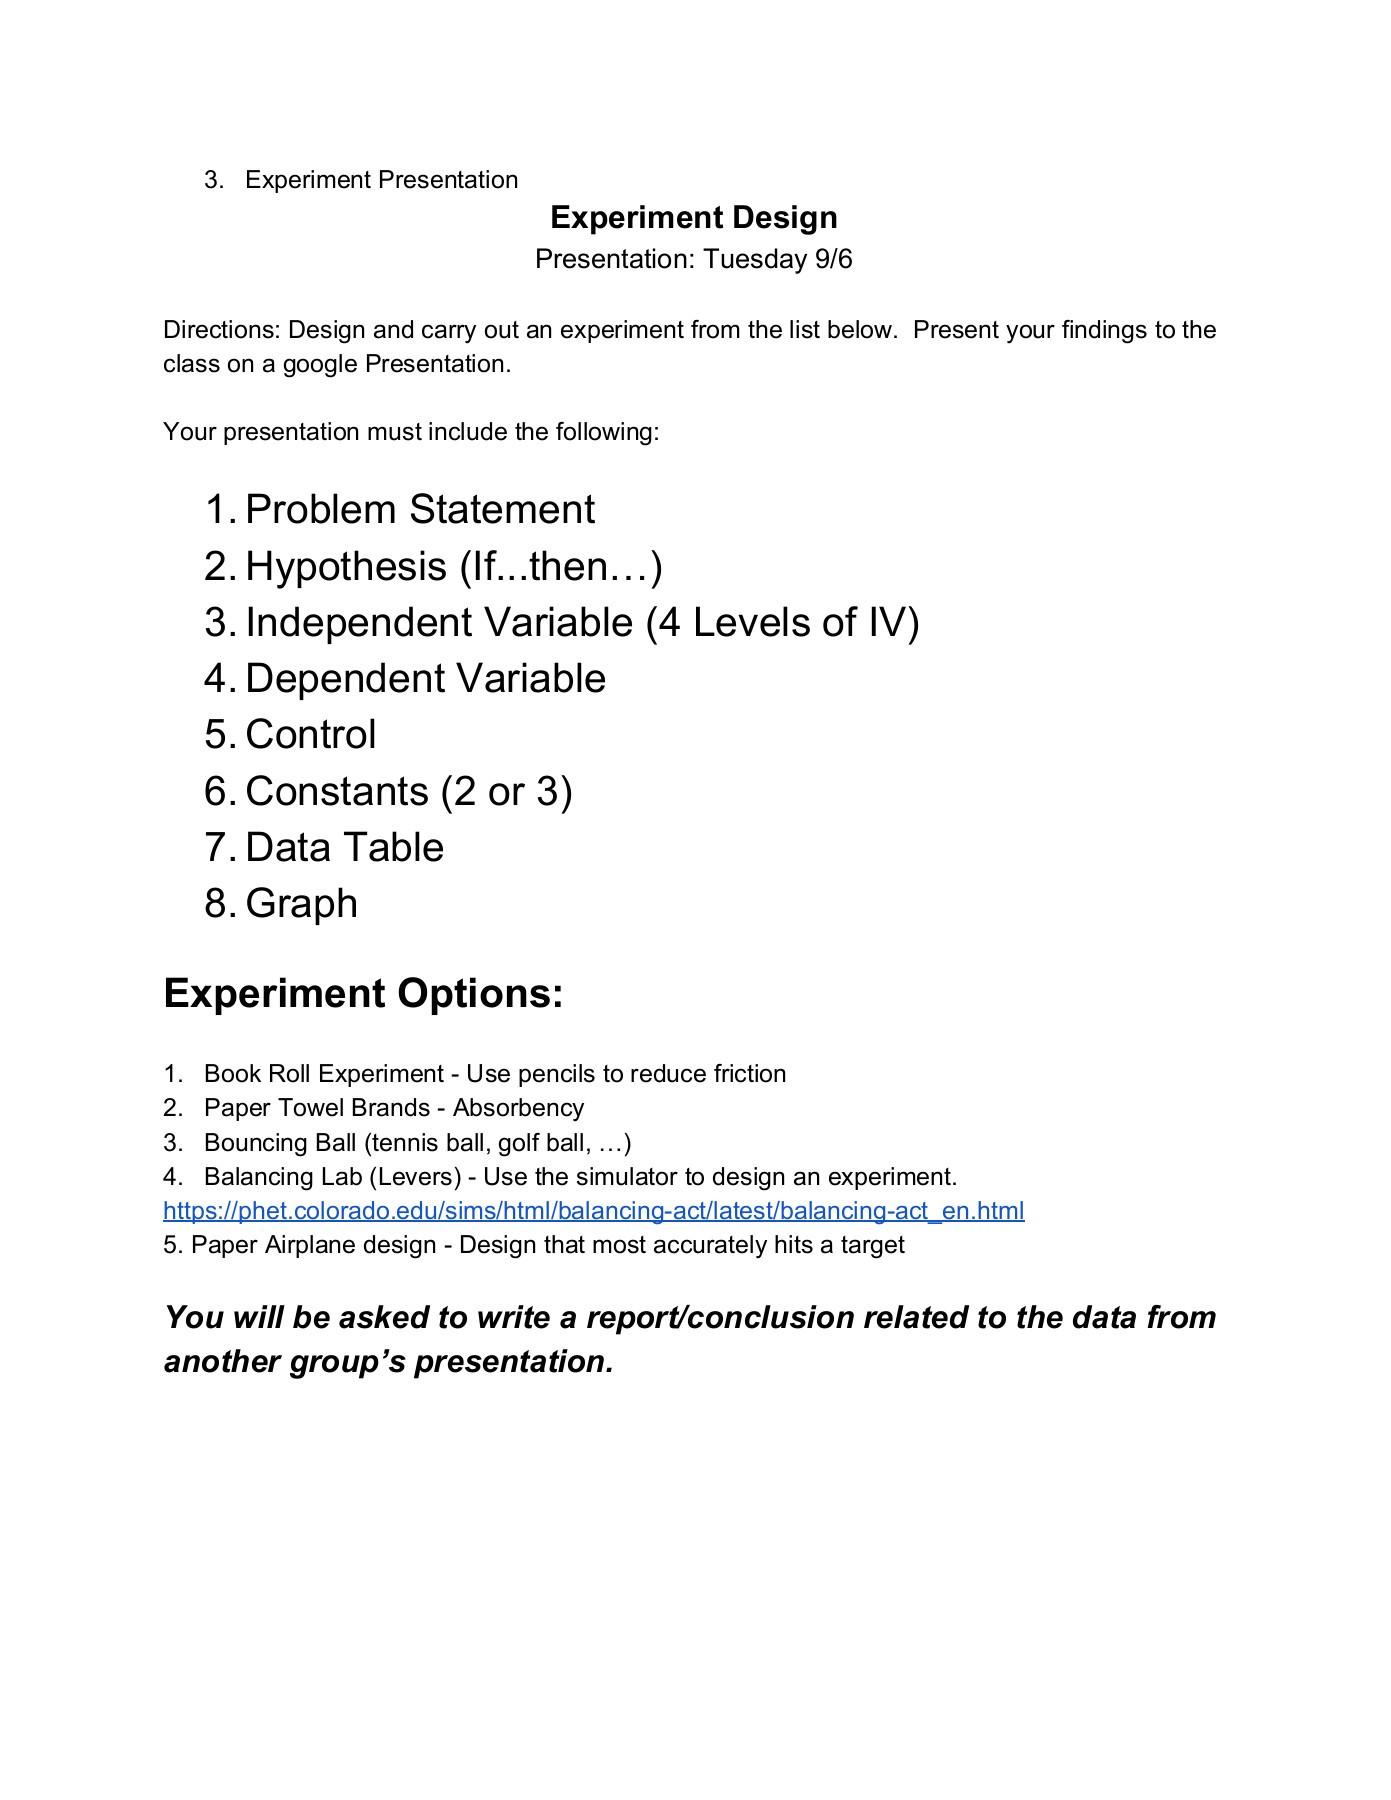 Speed Problem Worksheet Answers Copyofgreenscienceportfoliolopez 2017 1 Pages 51 78